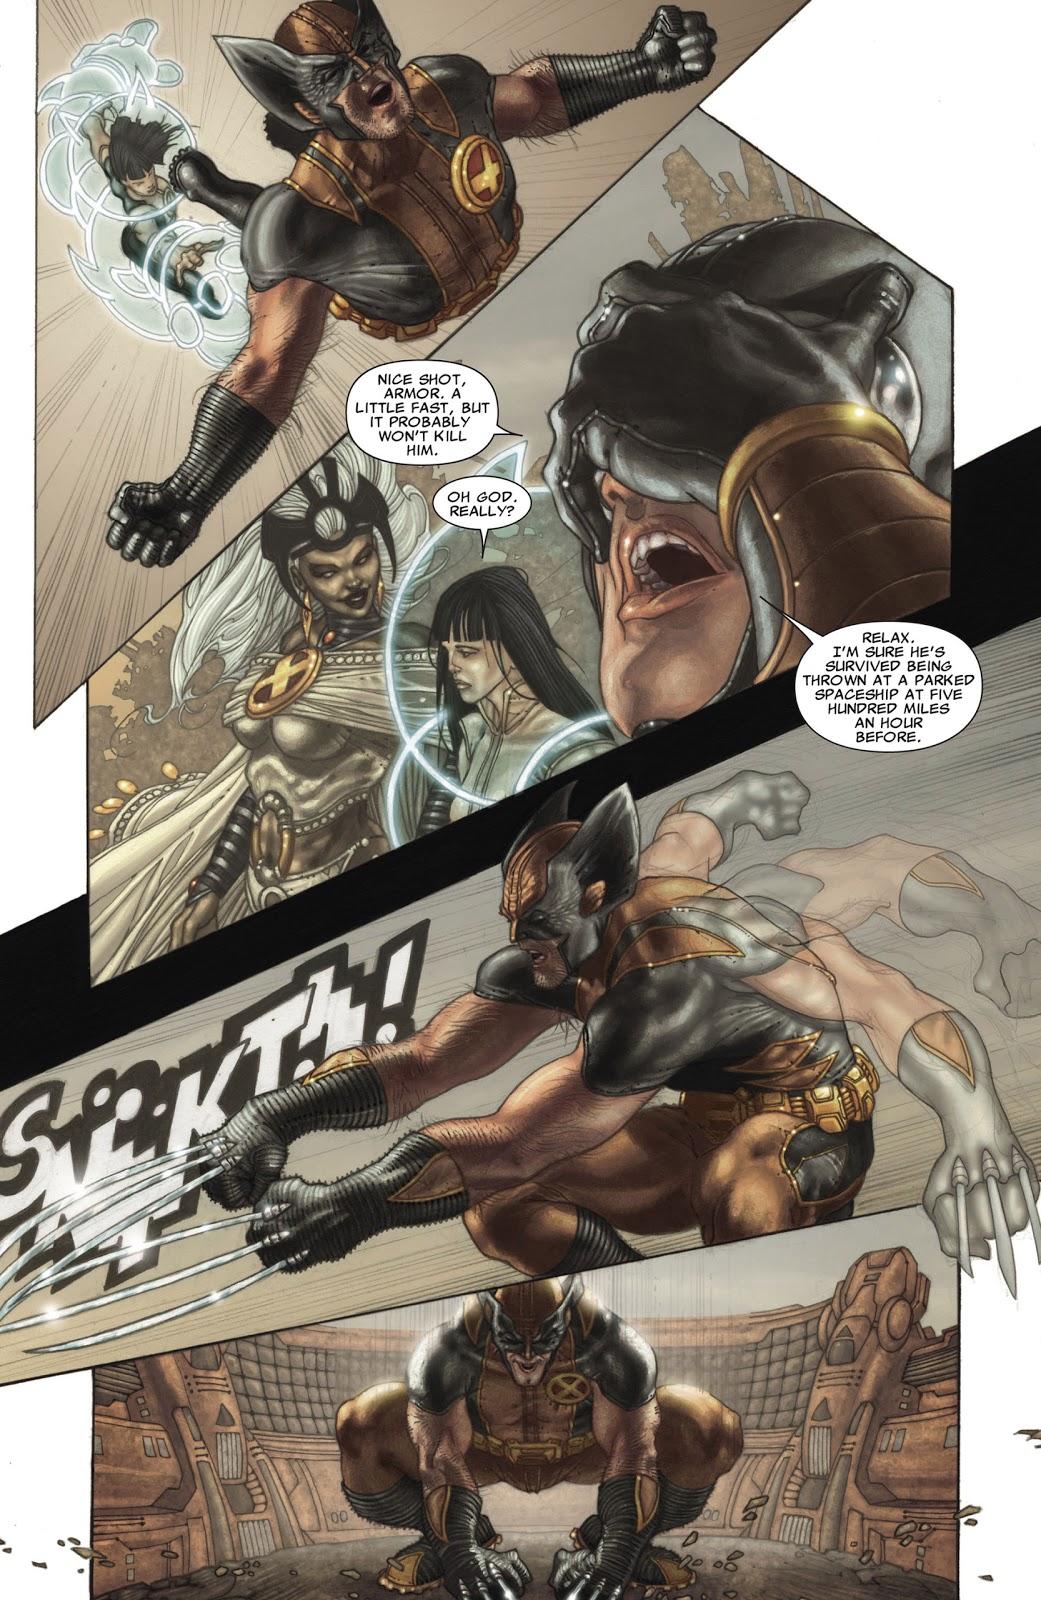 Astonishing X-Men Ghost Box review